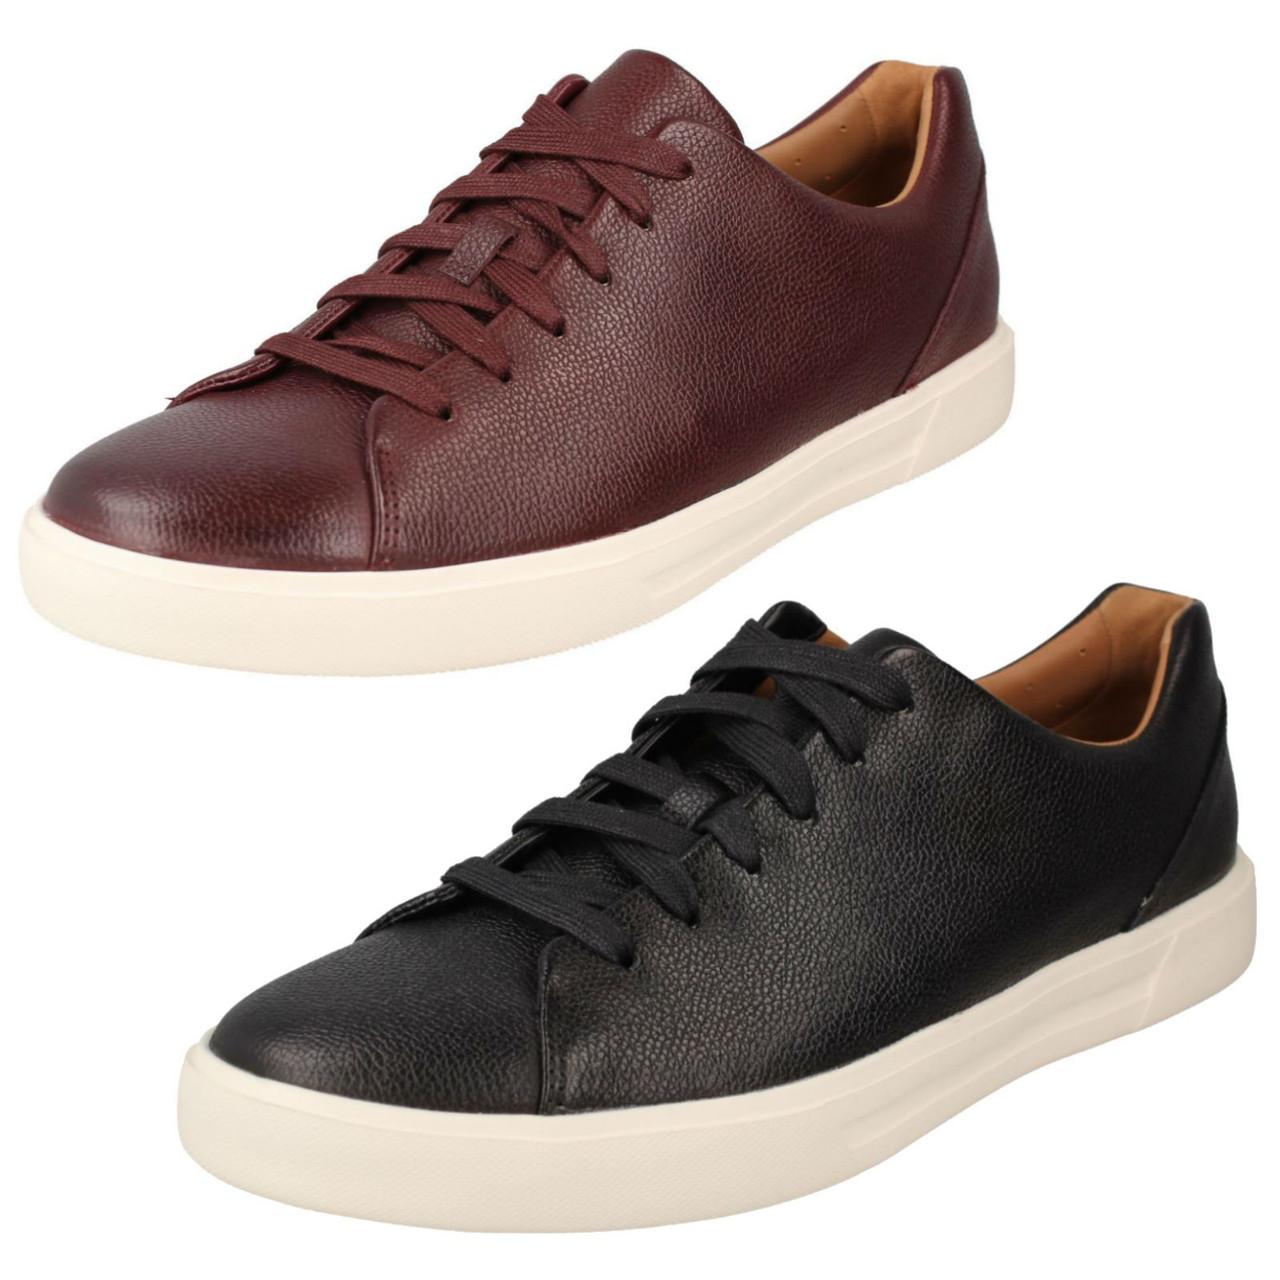 Clarks Casual Shoes Un Costa Lace